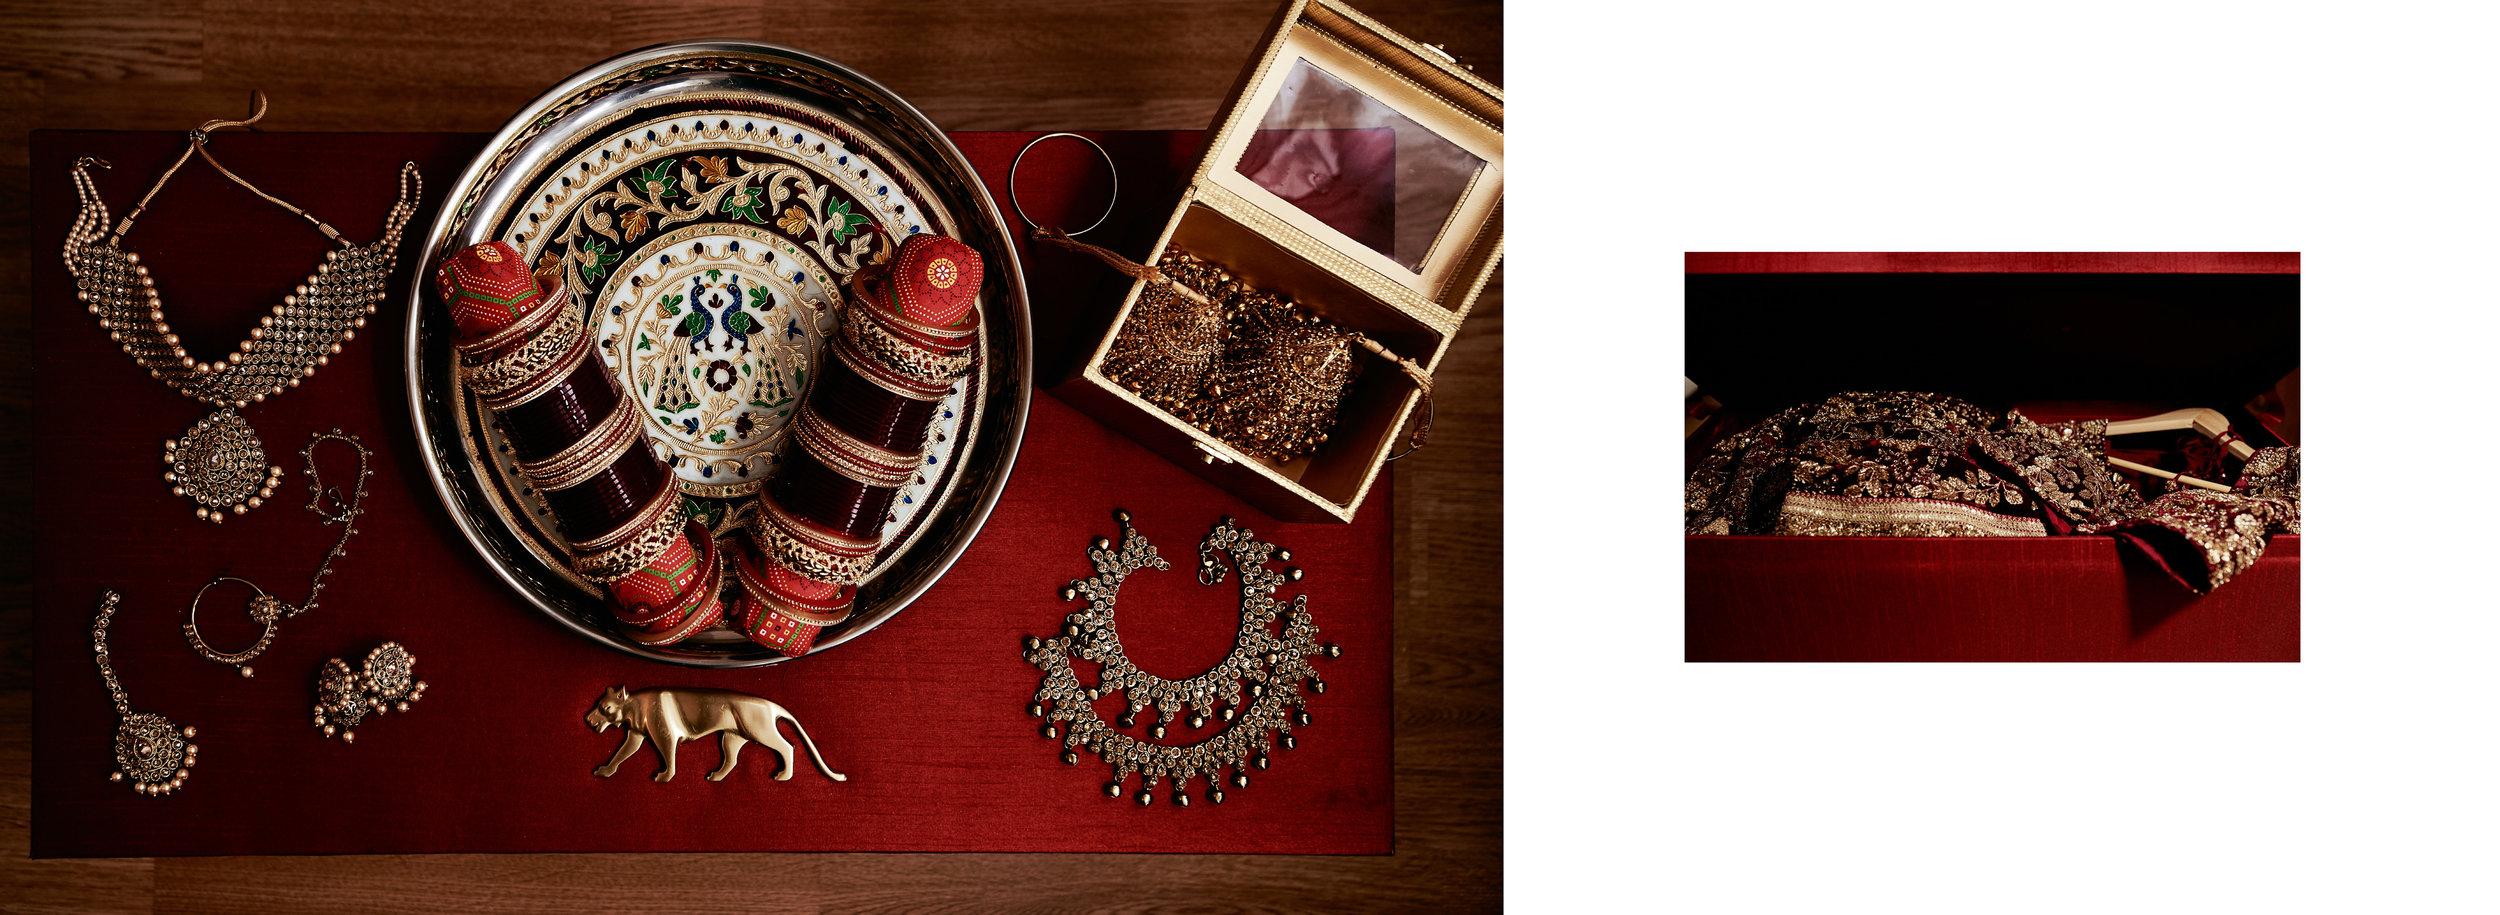 Sikh Wedding Album spread 2 - bride details